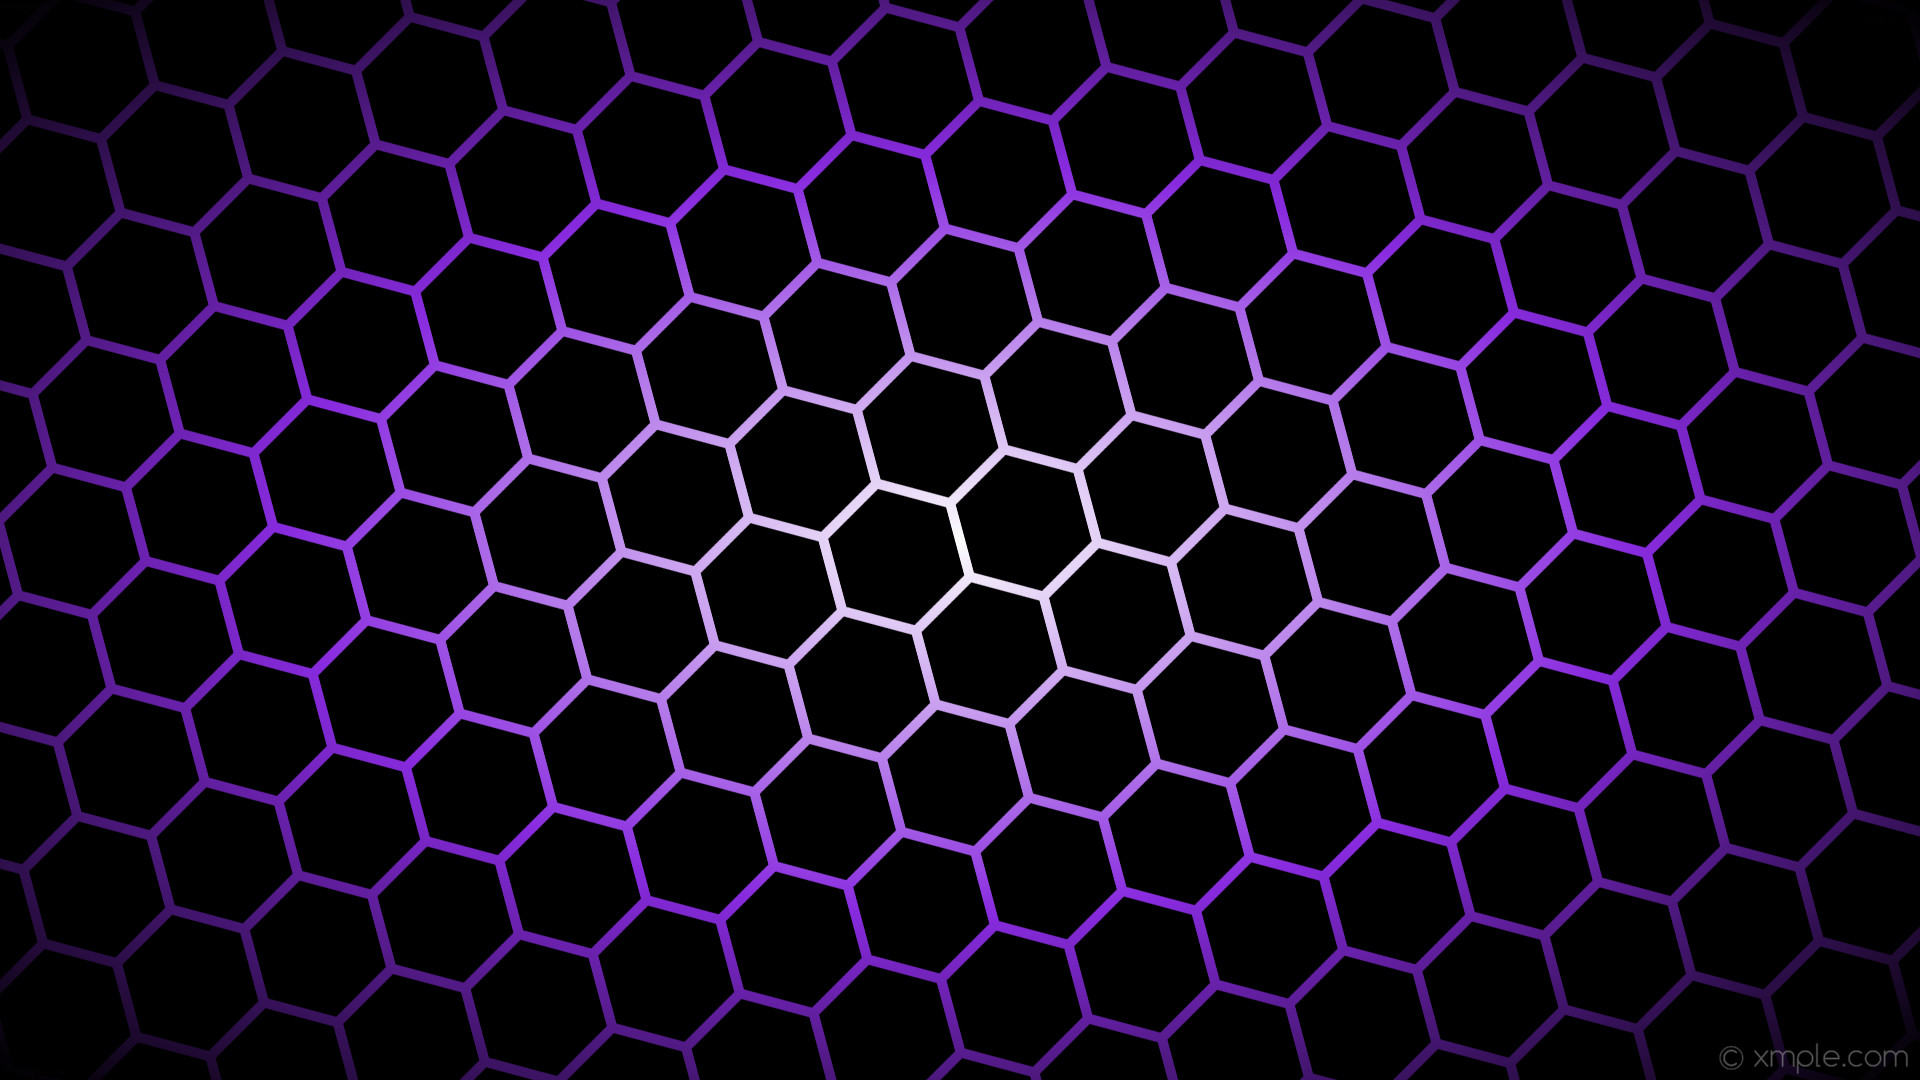 wallpaper black glow hexagon white purple gradient blue violet #000000  #ffffff #8a2be2 diagonal